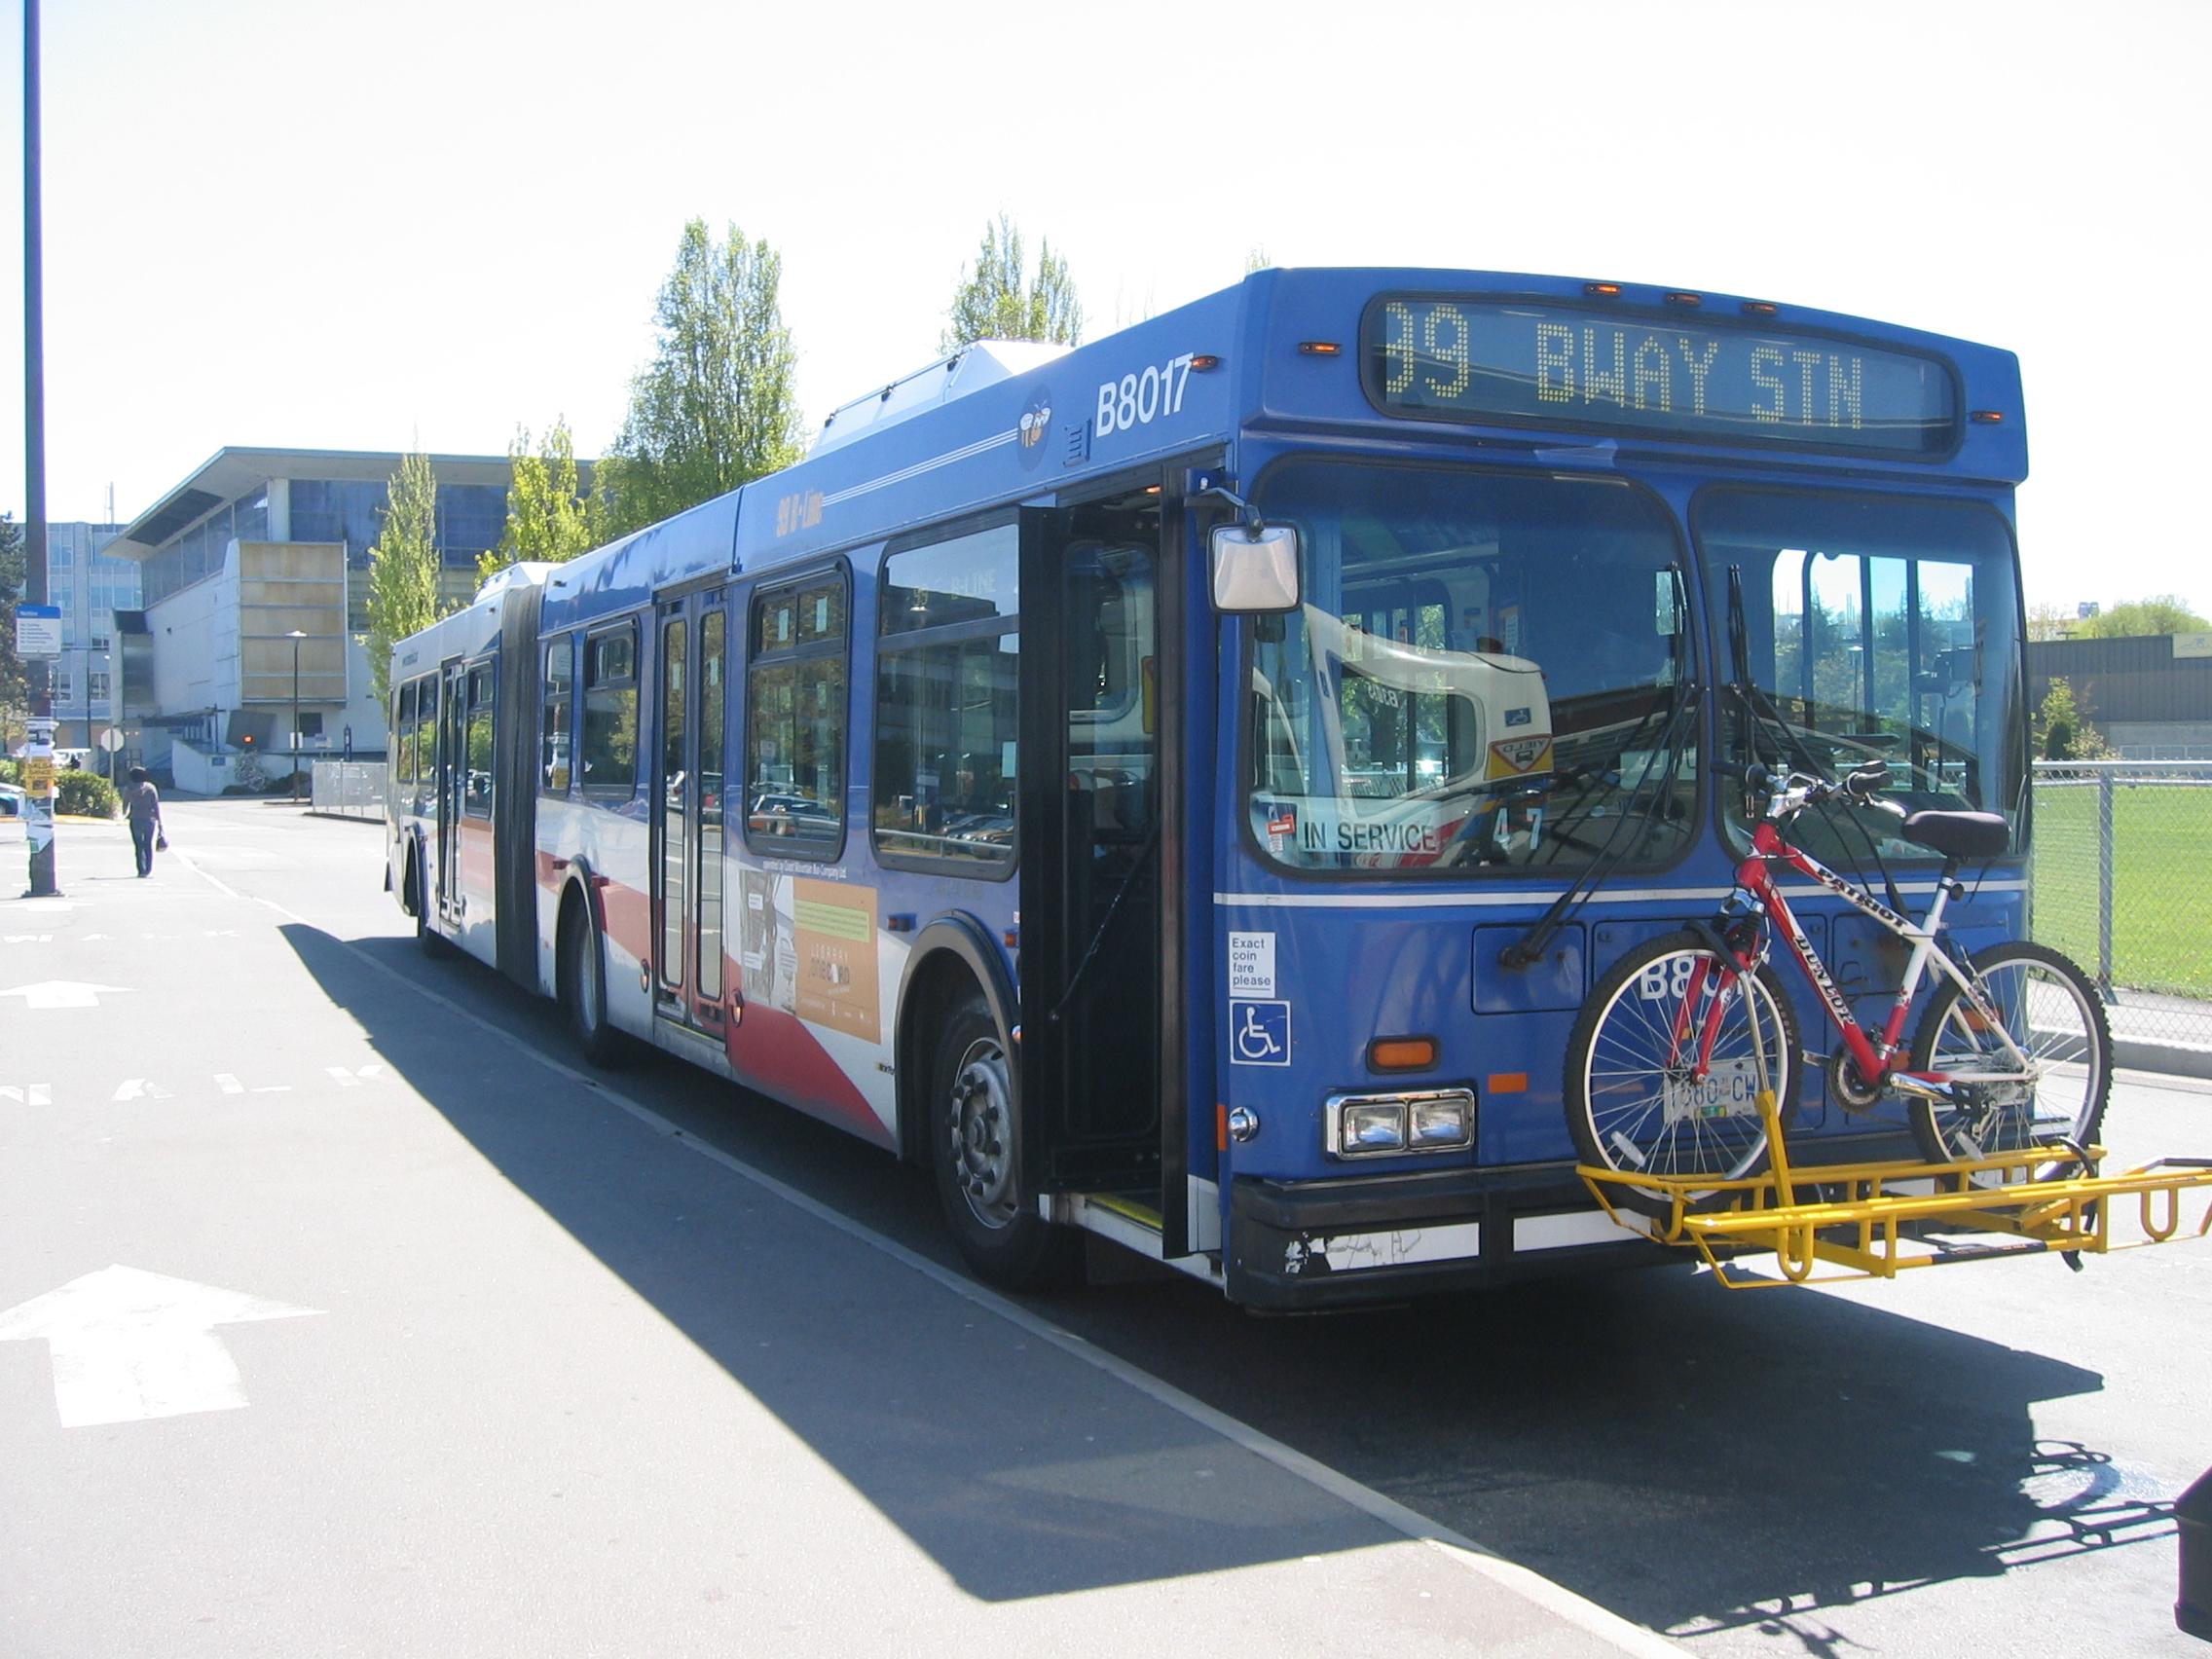 Vancouver translink bus-6307